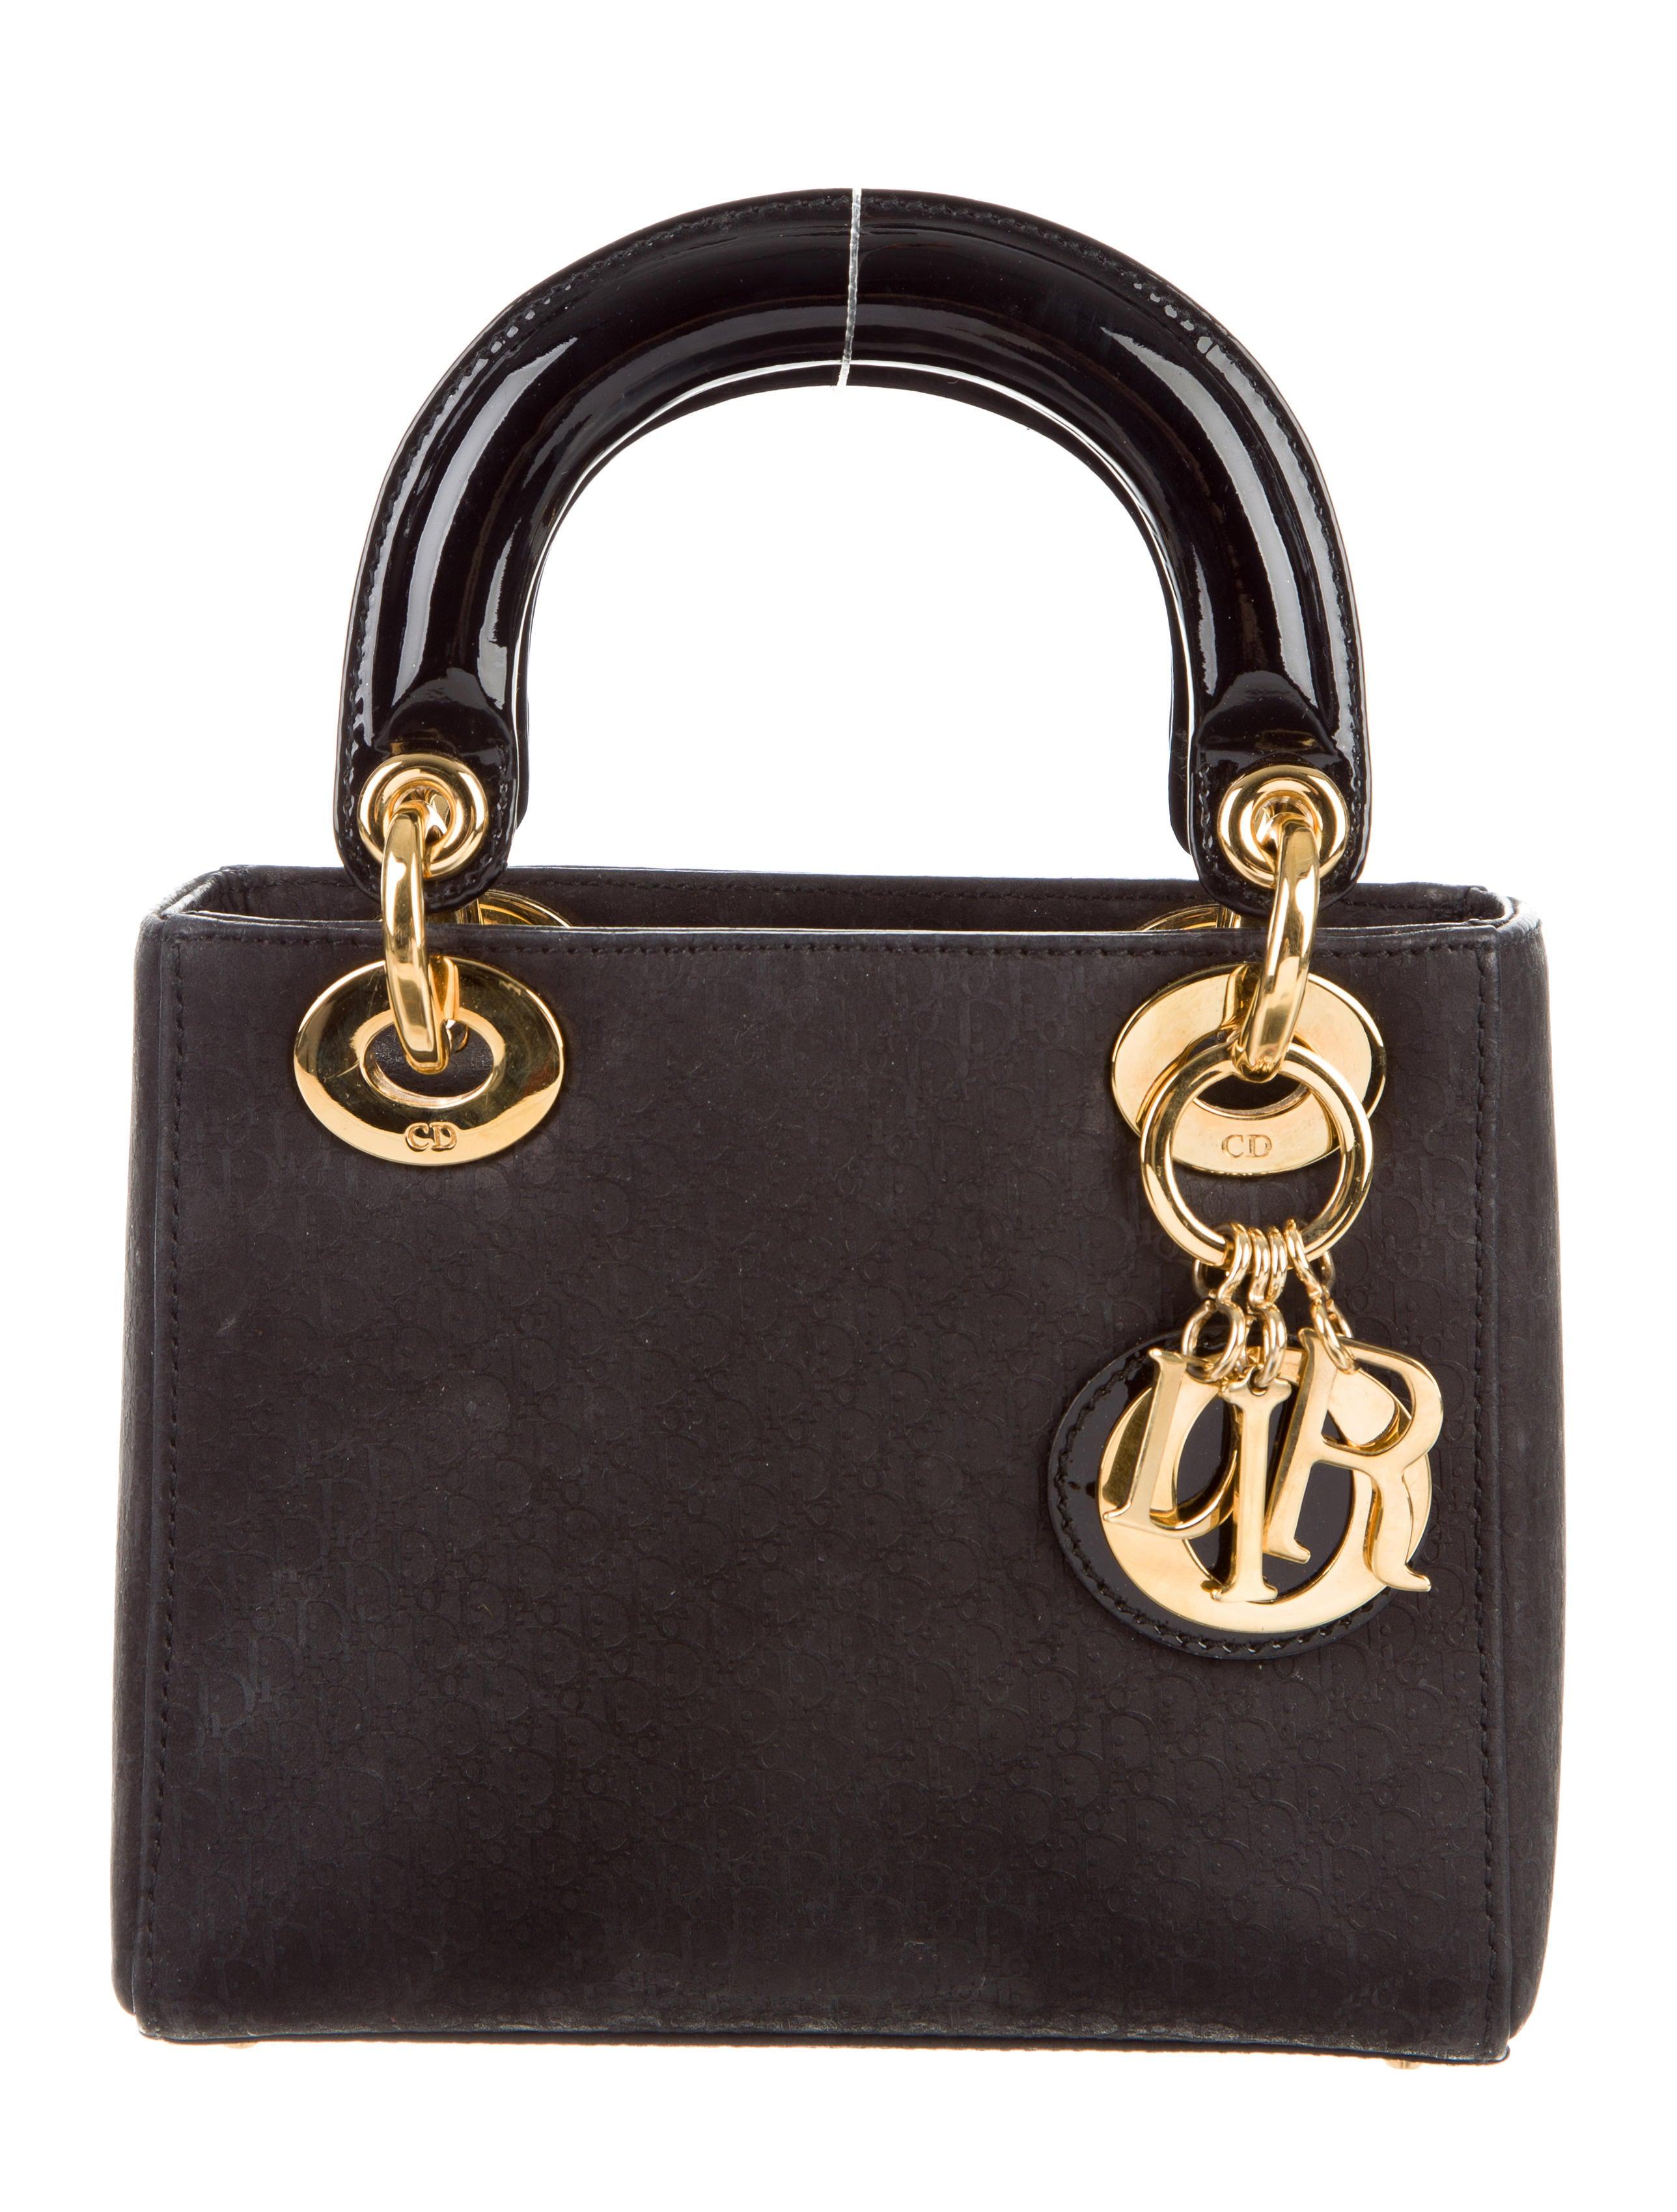 Elegant Christian Dior Large Diorissimo Bag  Handbags  CHR53119  The